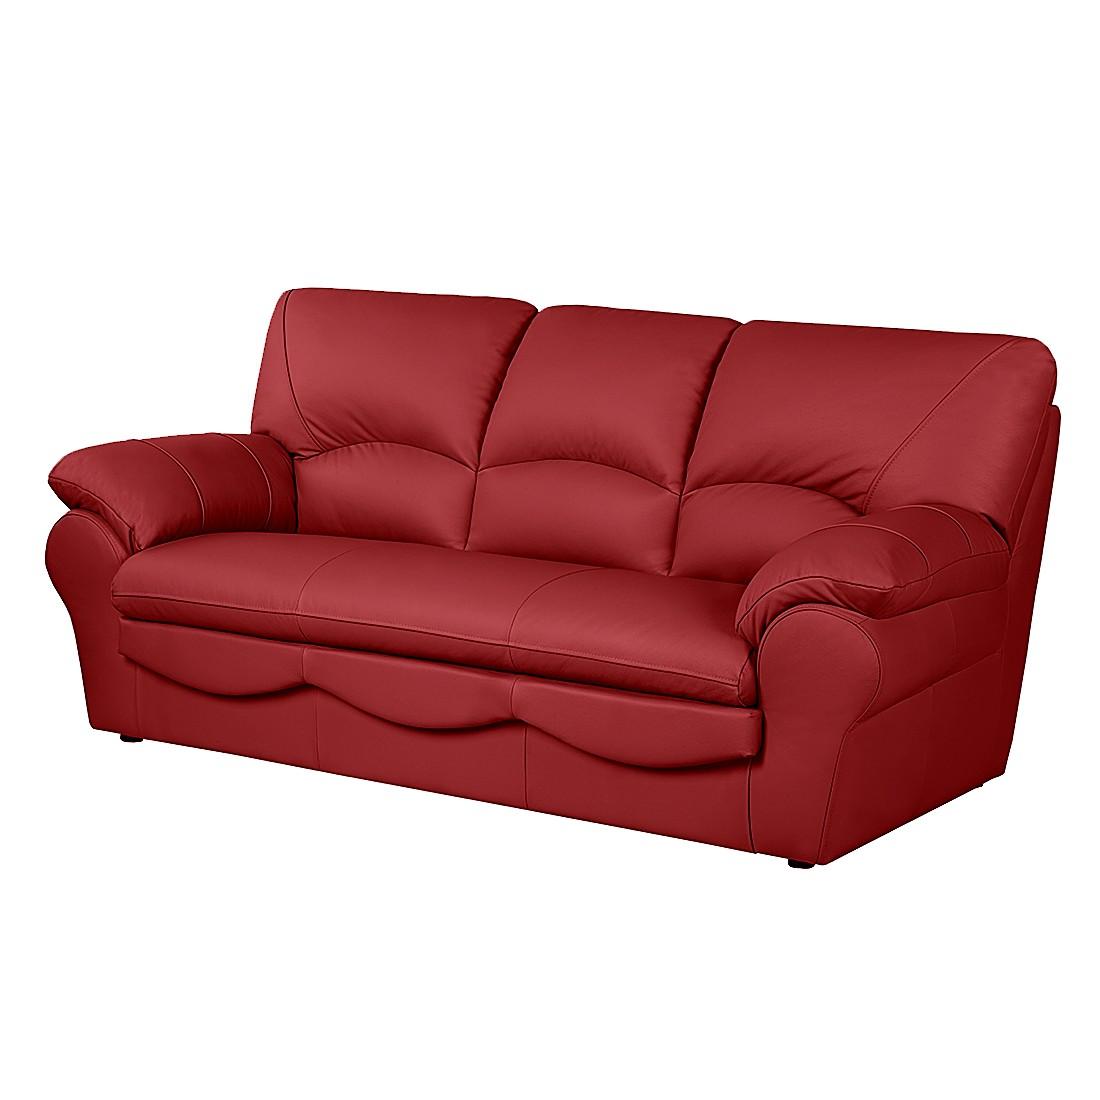 Schlafsofa Torsby - Echtleder Rot, Nuovoform